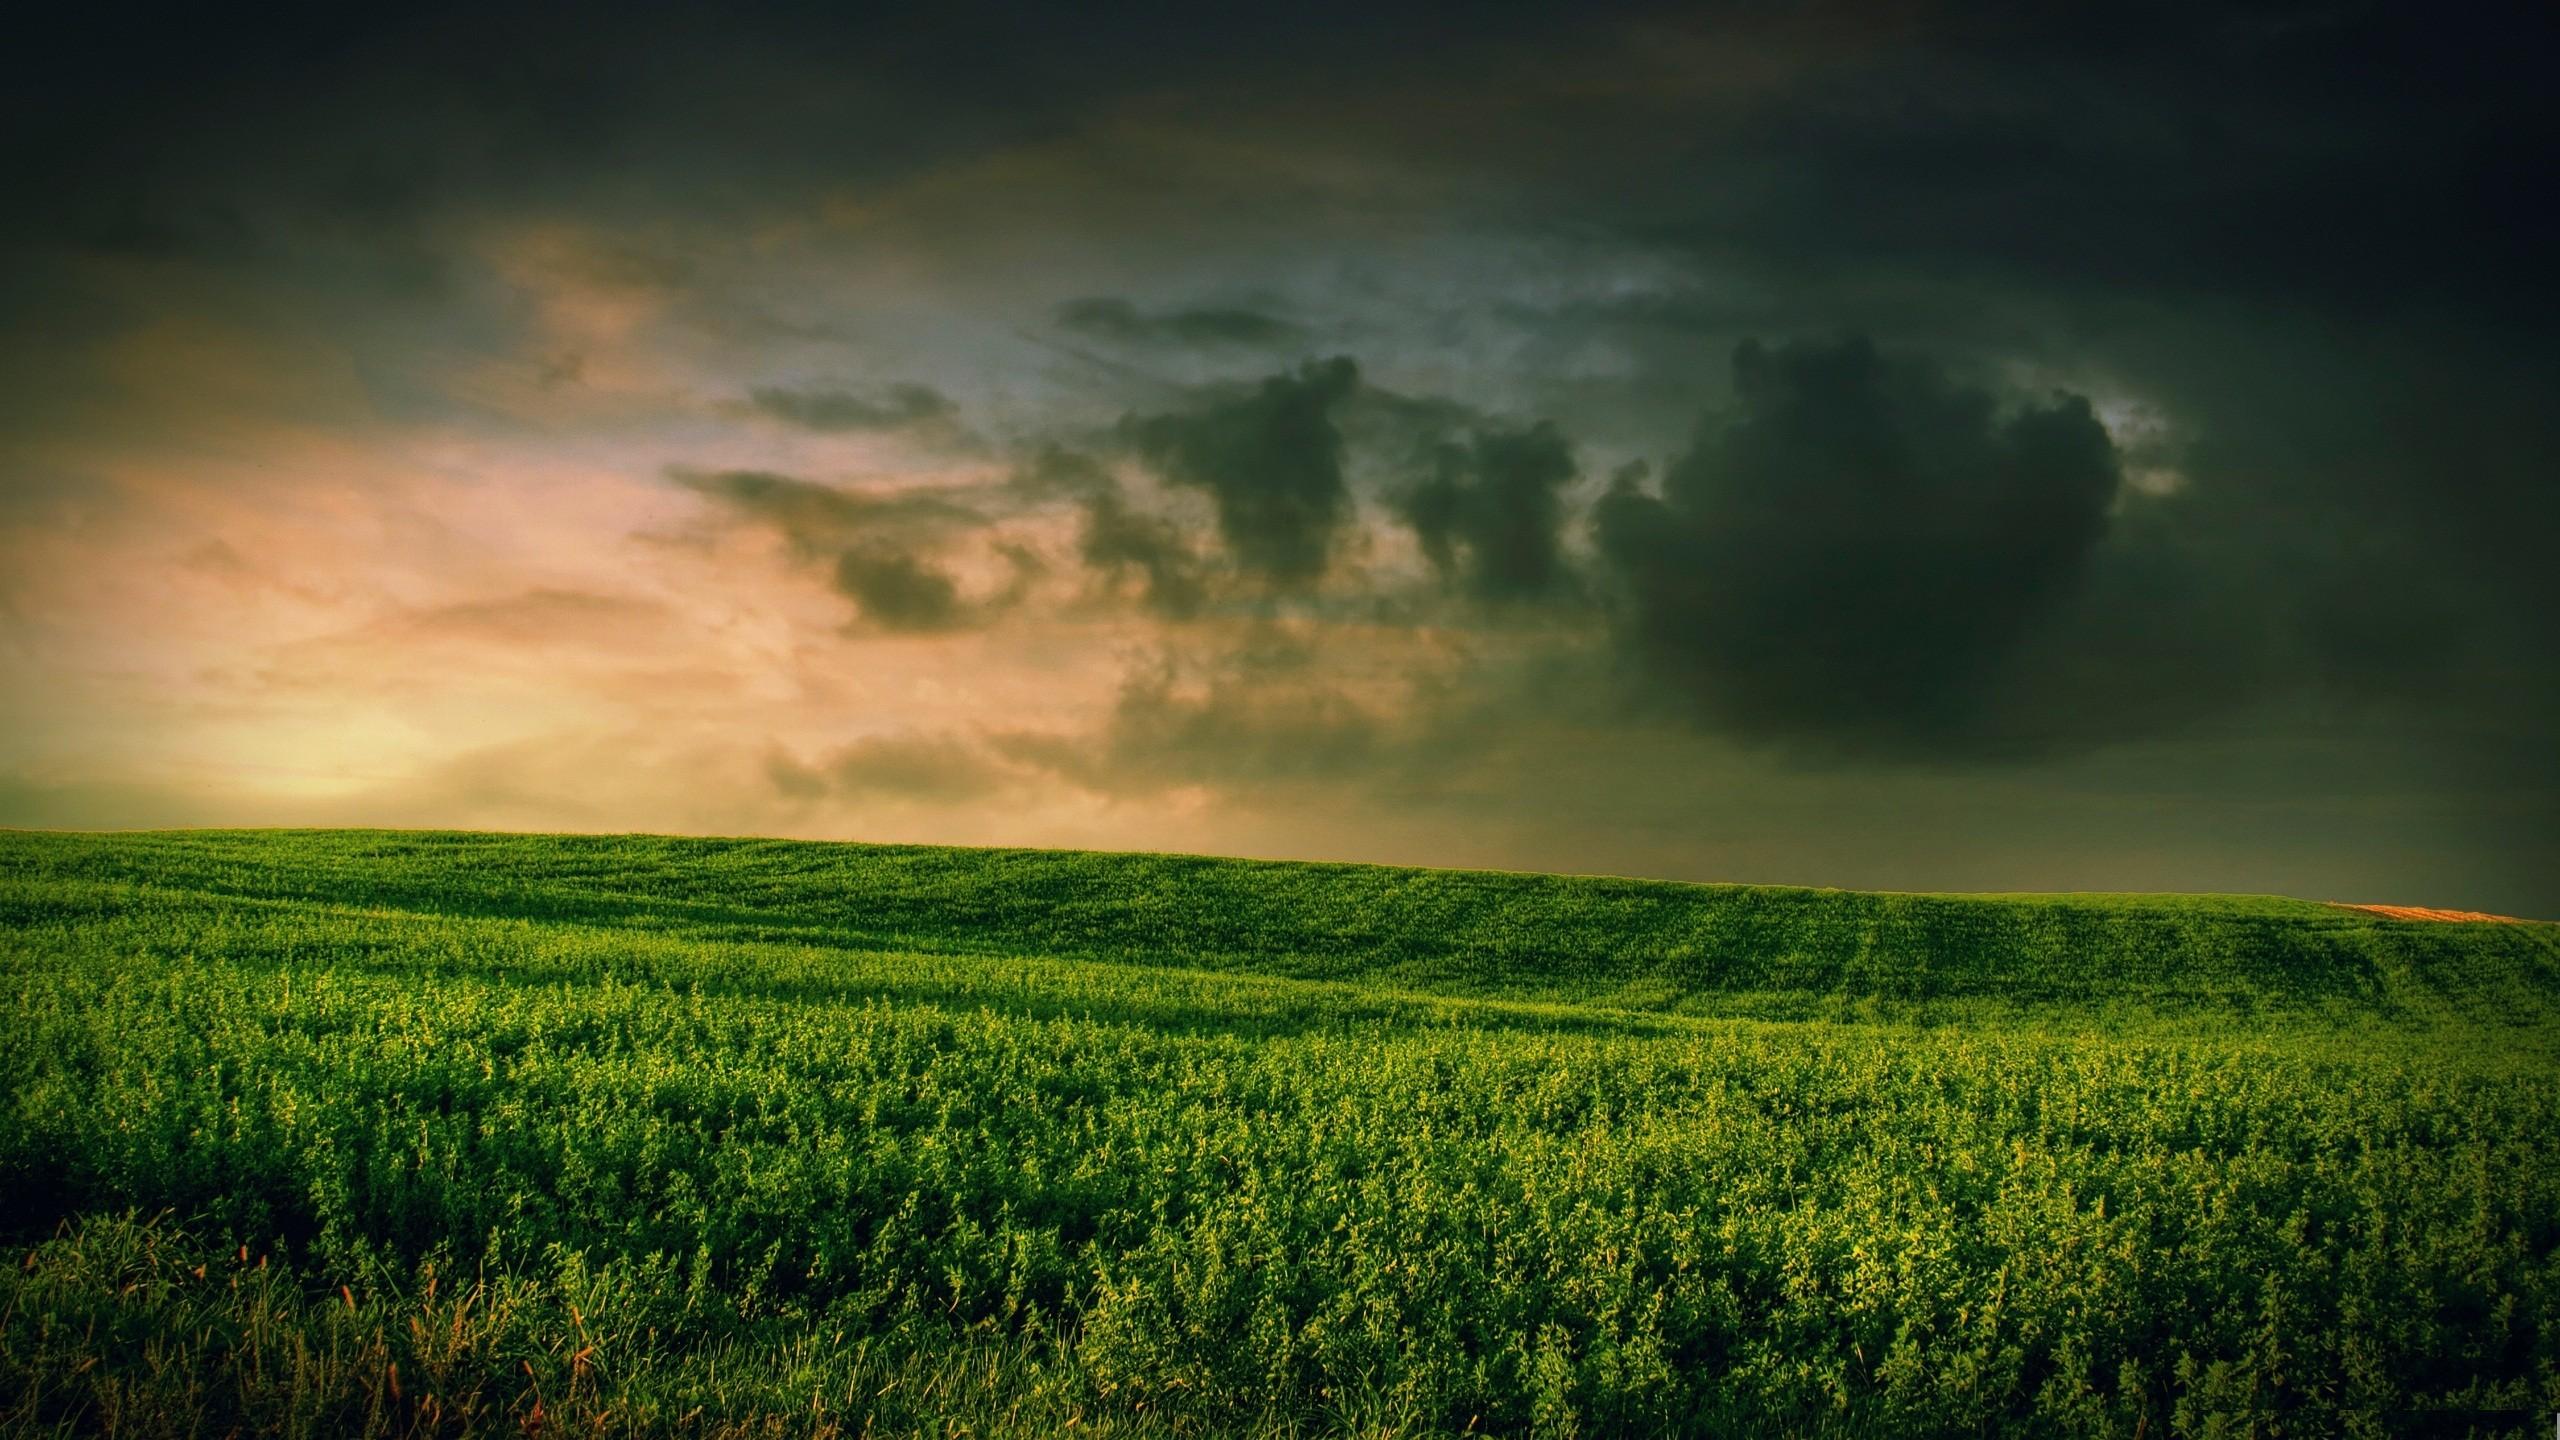 abstract grass wallpaper - photo #5